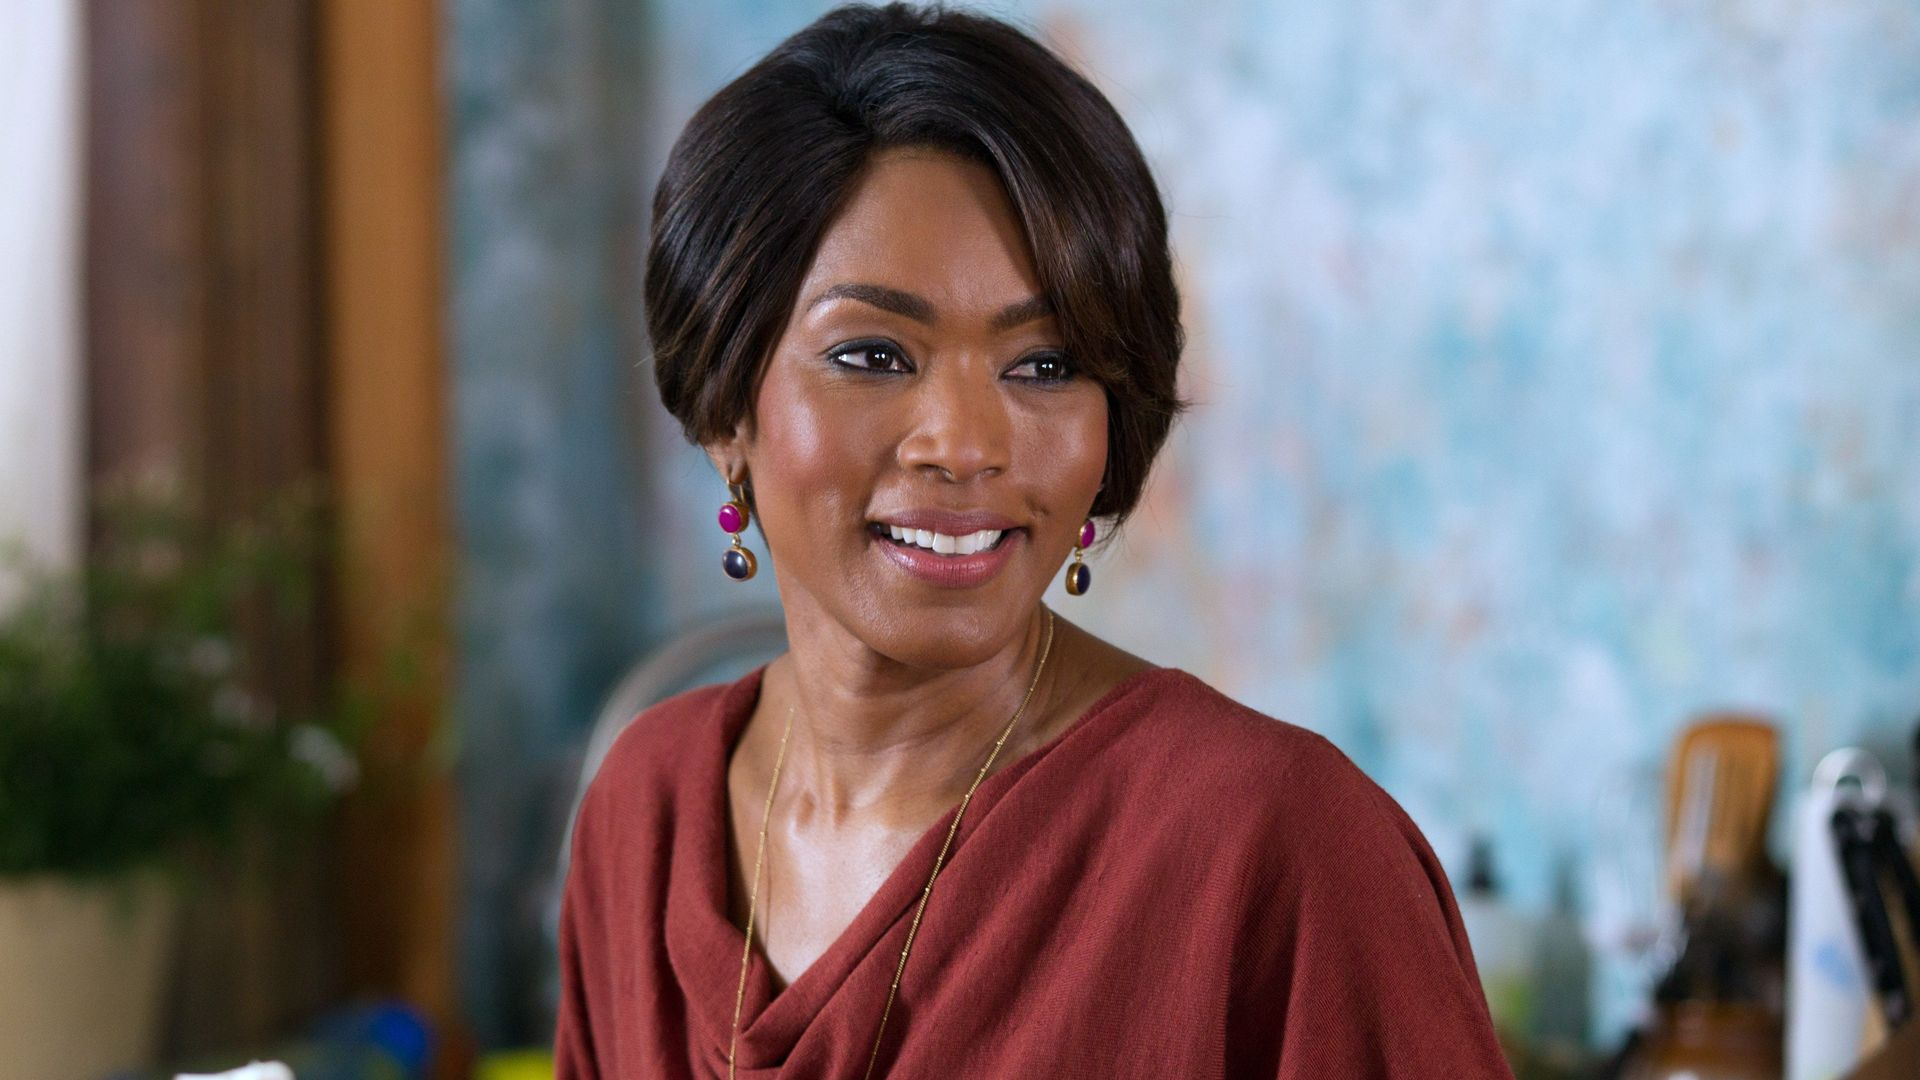 Black History Month Highlights Angela Bassett